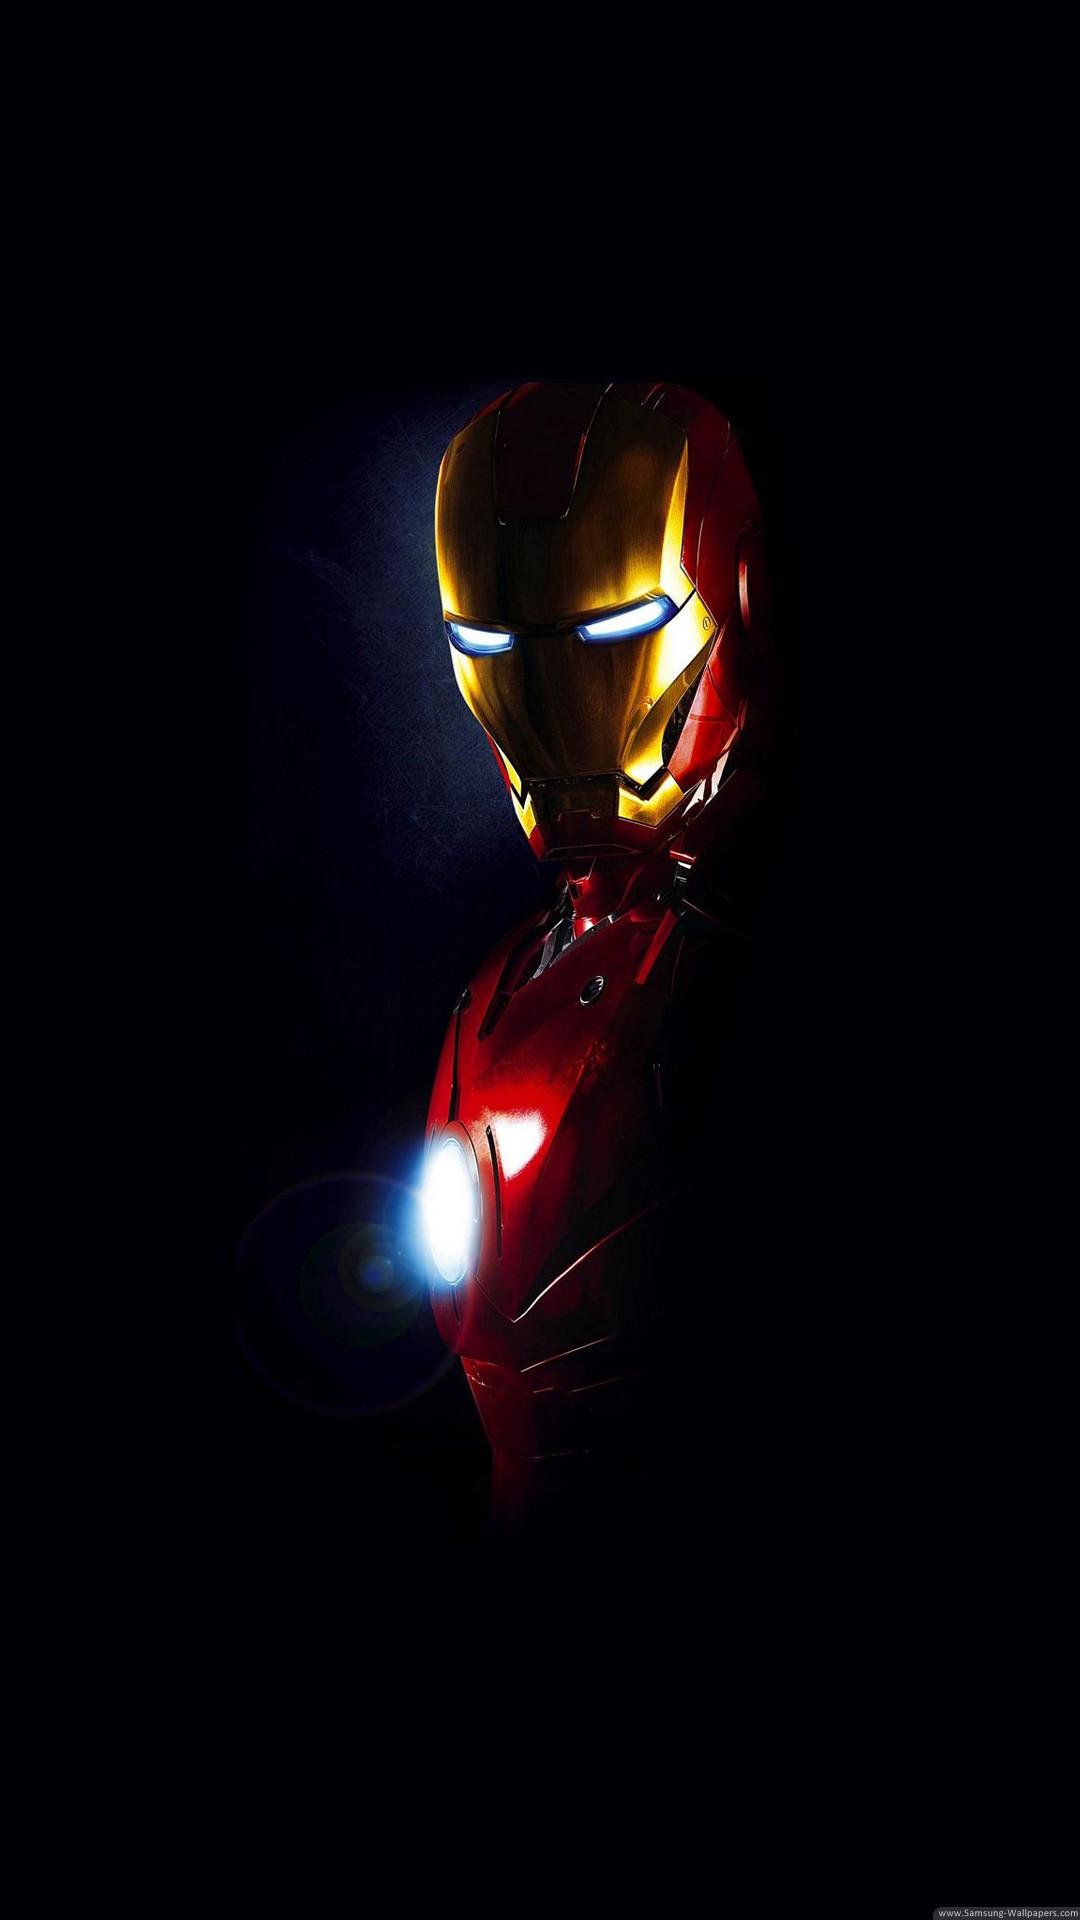 1920x1200 Wallpaperwiki Cool Arc Reactor Iron Man